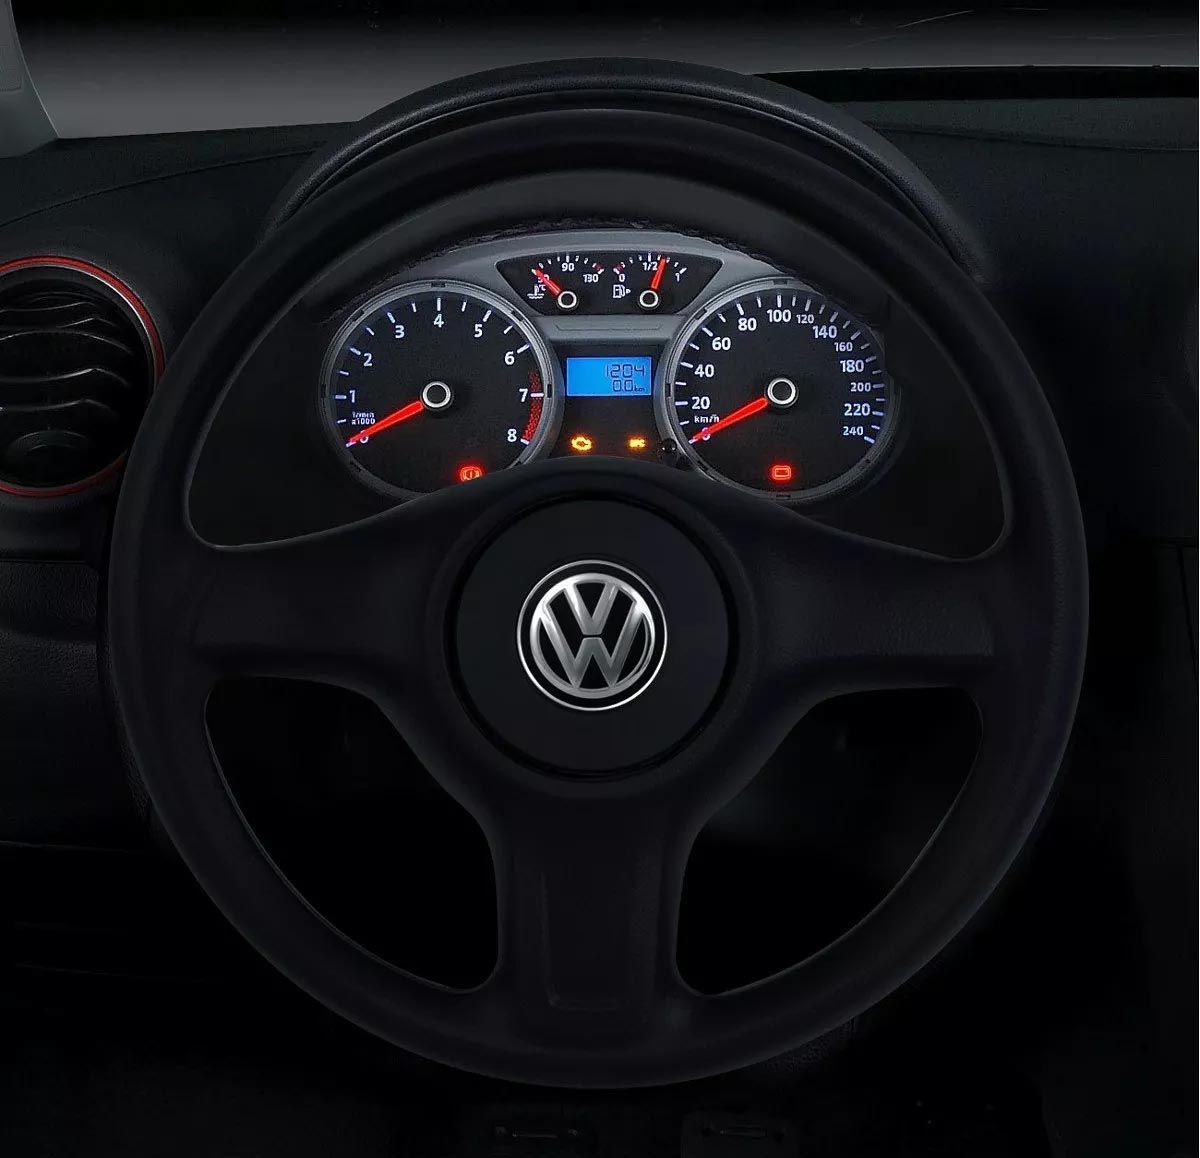 Volante Original Volkswagen G5 Cubo Gol G5 Polo Golf Fox Spacefox Crossfox Poliparts